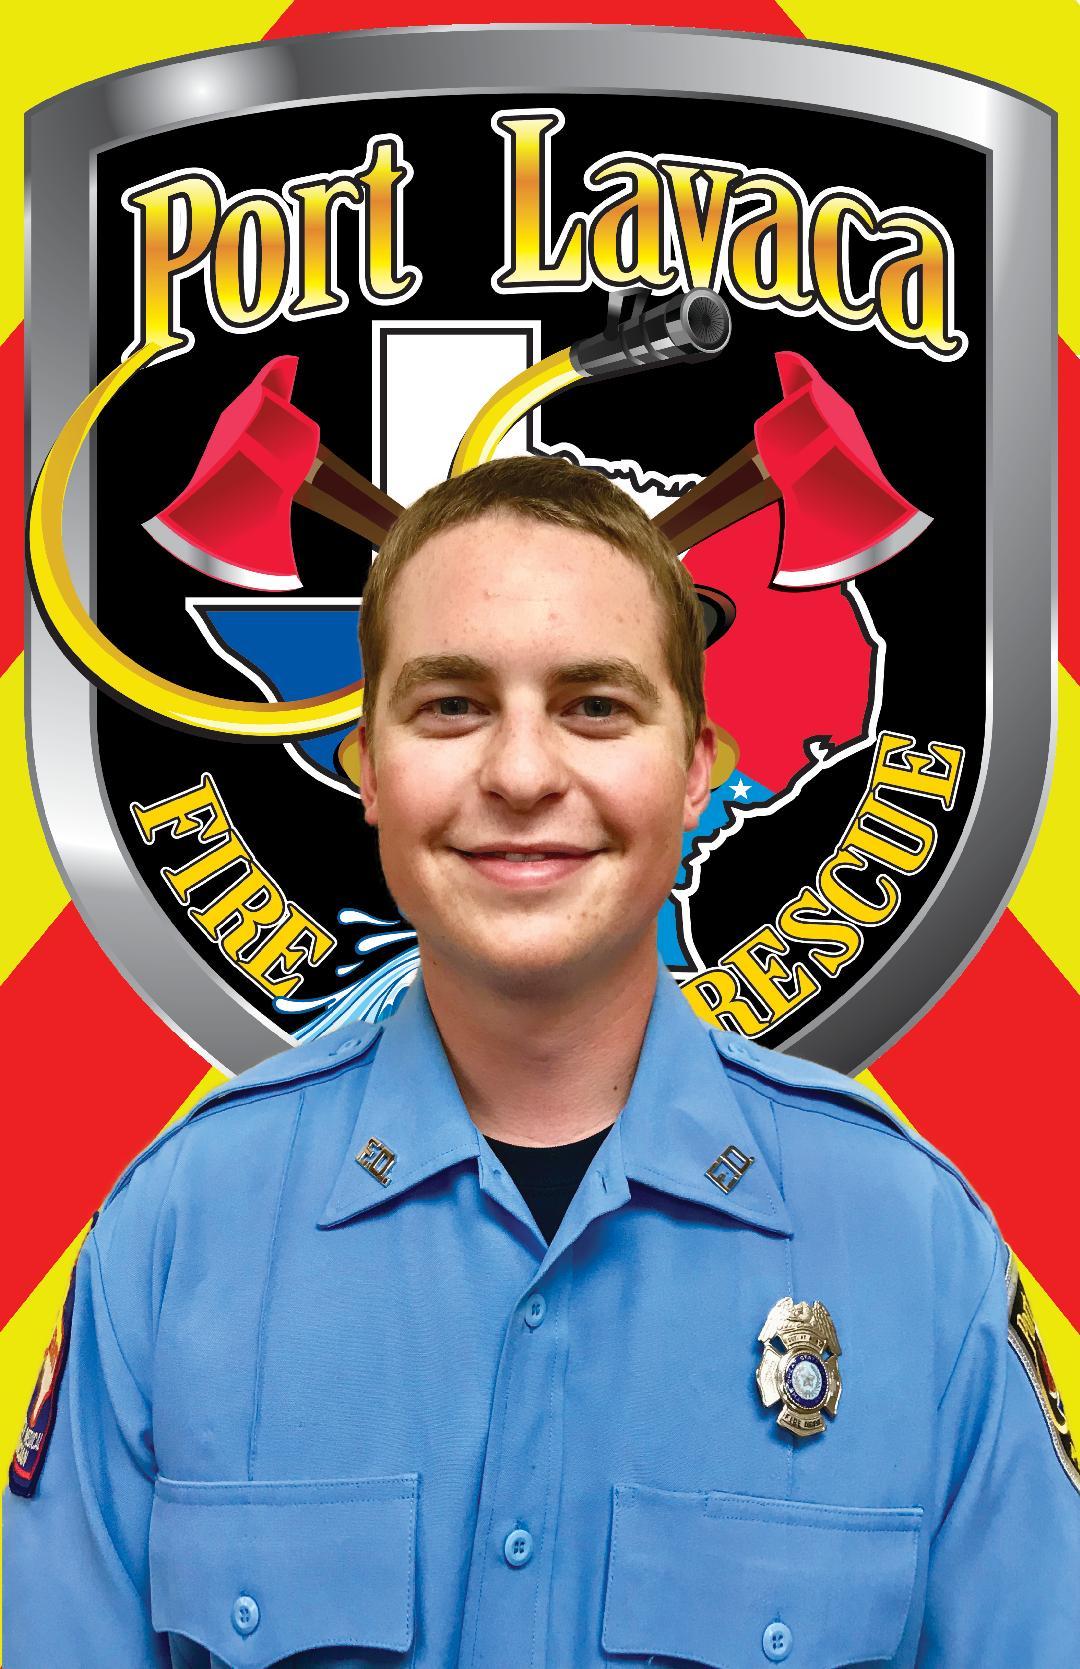 Firefighter Davis